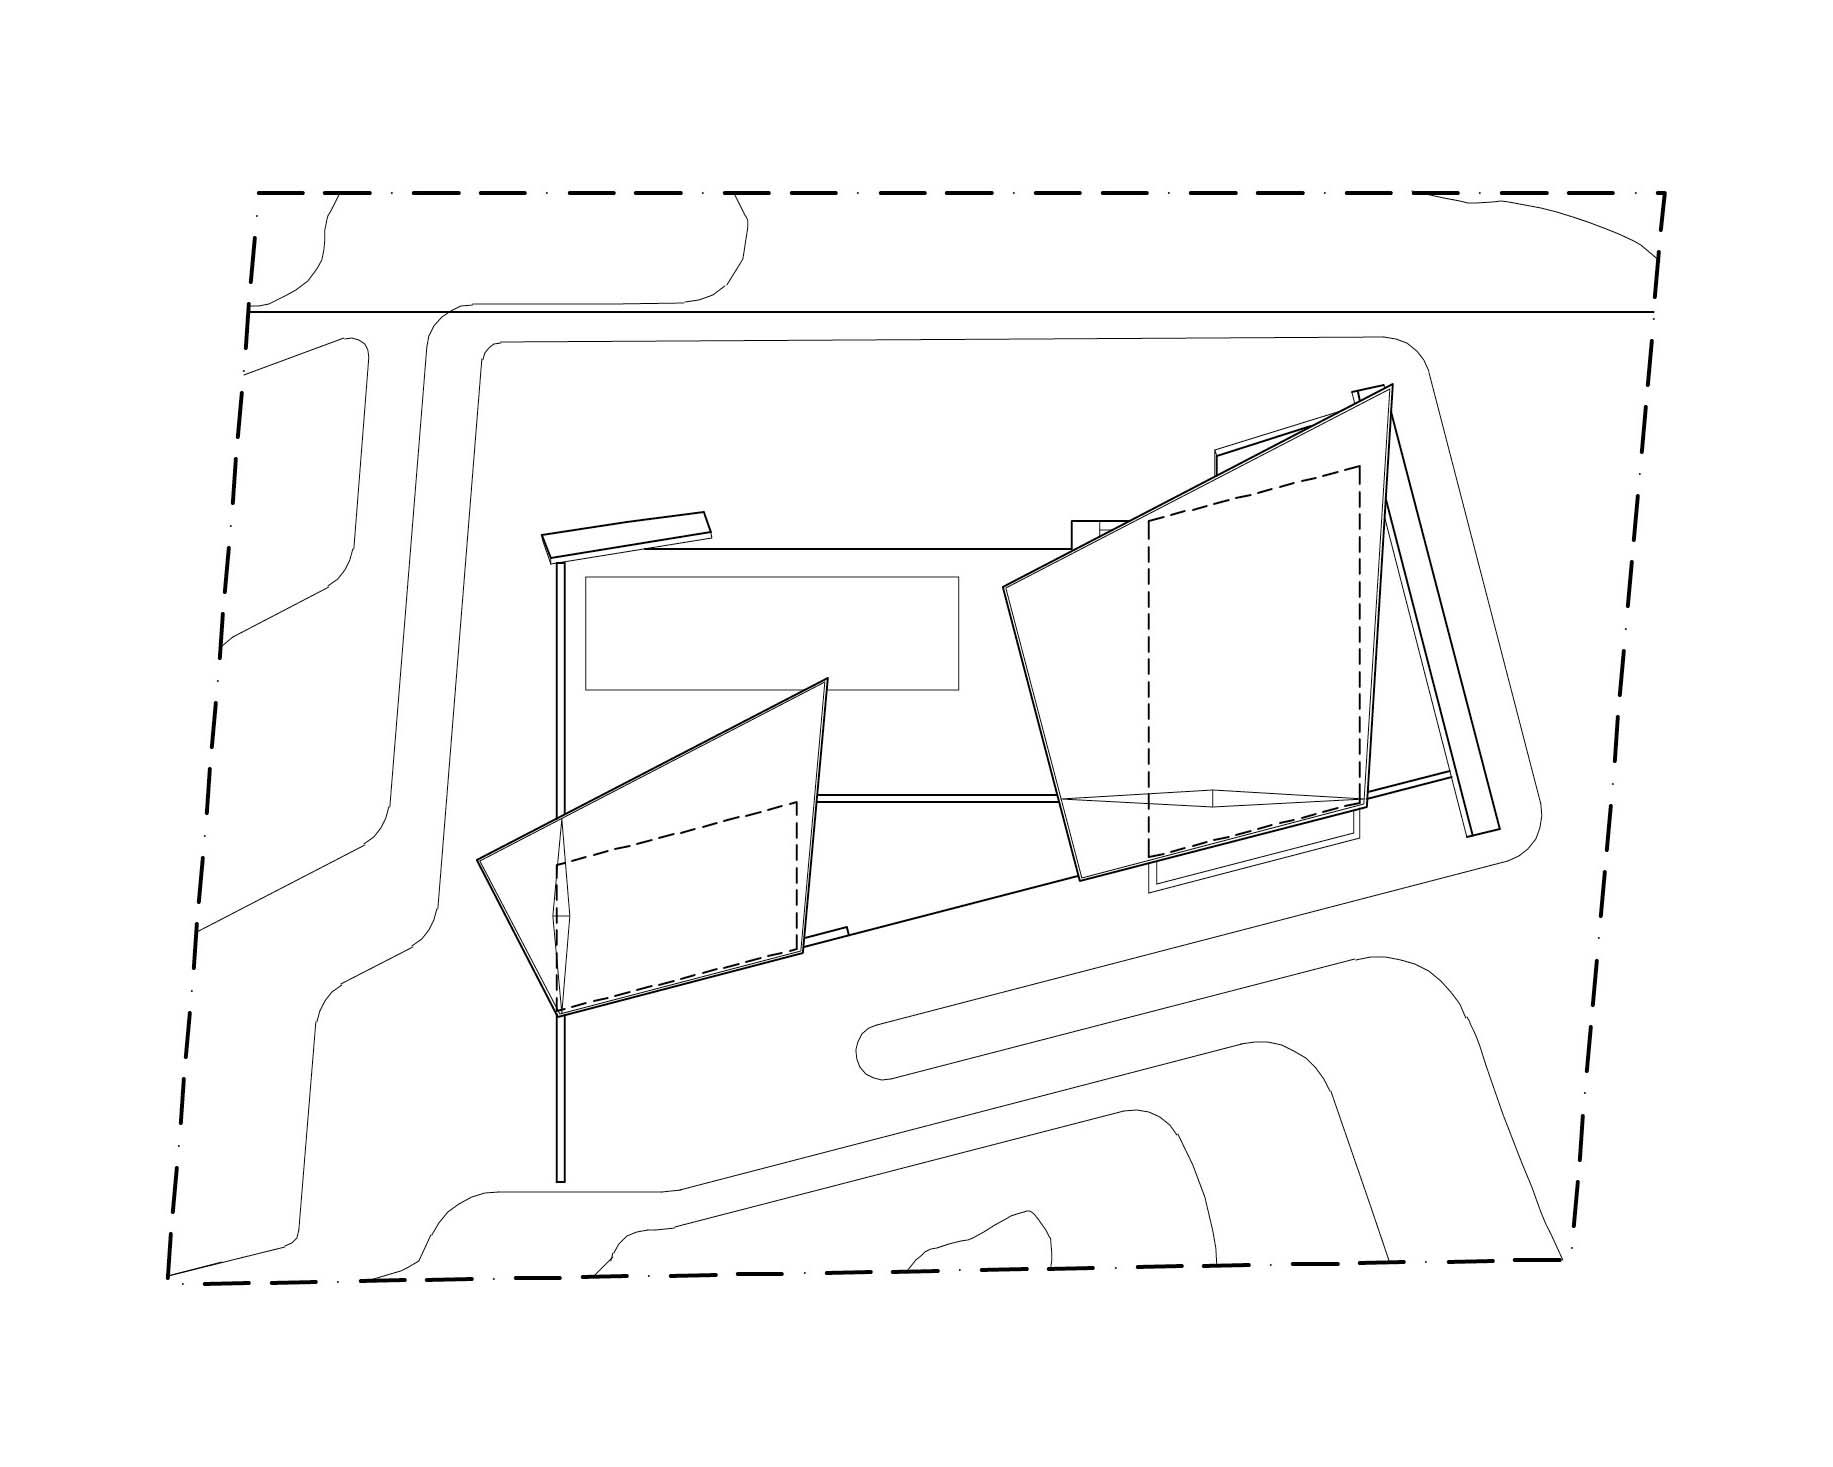 shelter-island-pavilion-by-stamberg-aferiat-associates-plan-drawing